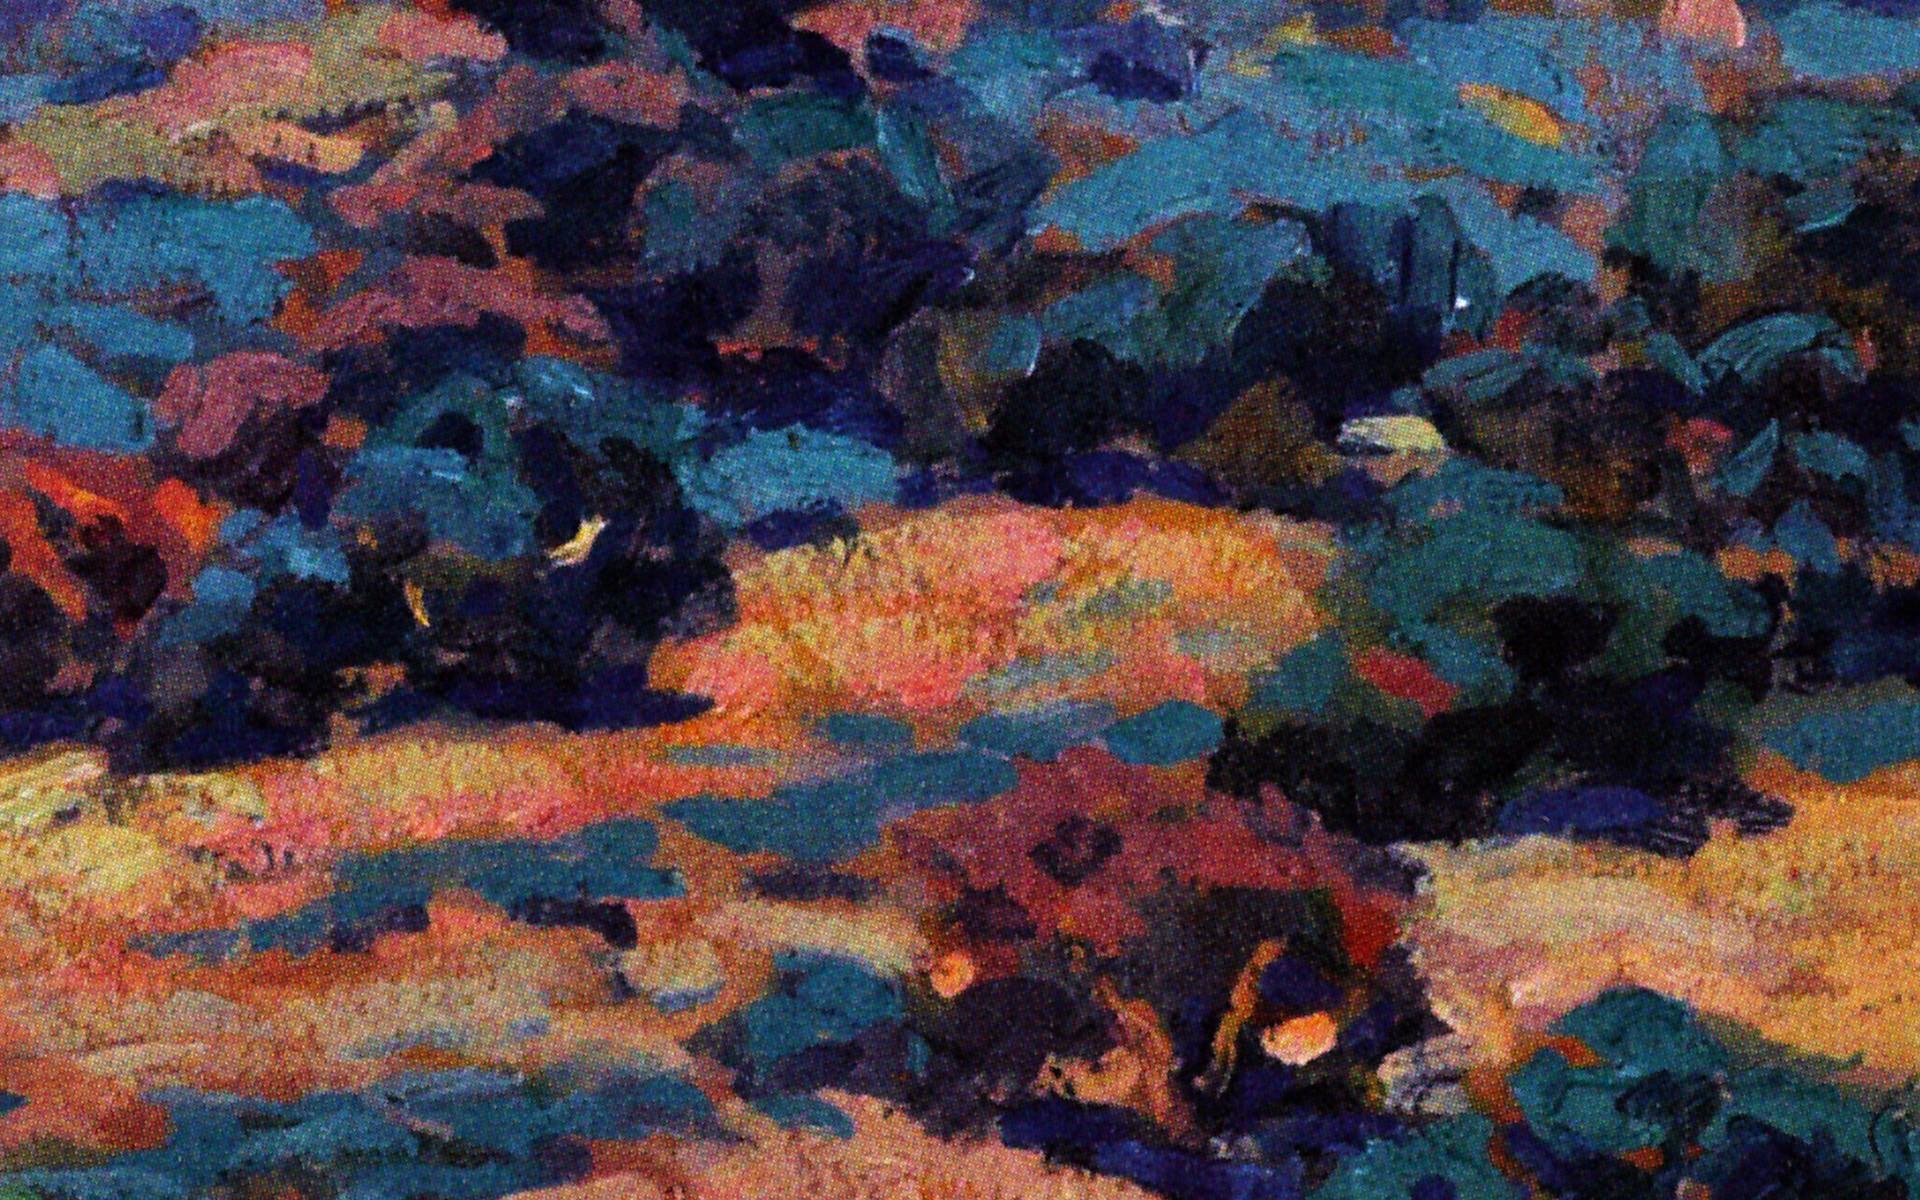 Download Paintings Impressionist Wallpaper 1920x1200 1920x1200